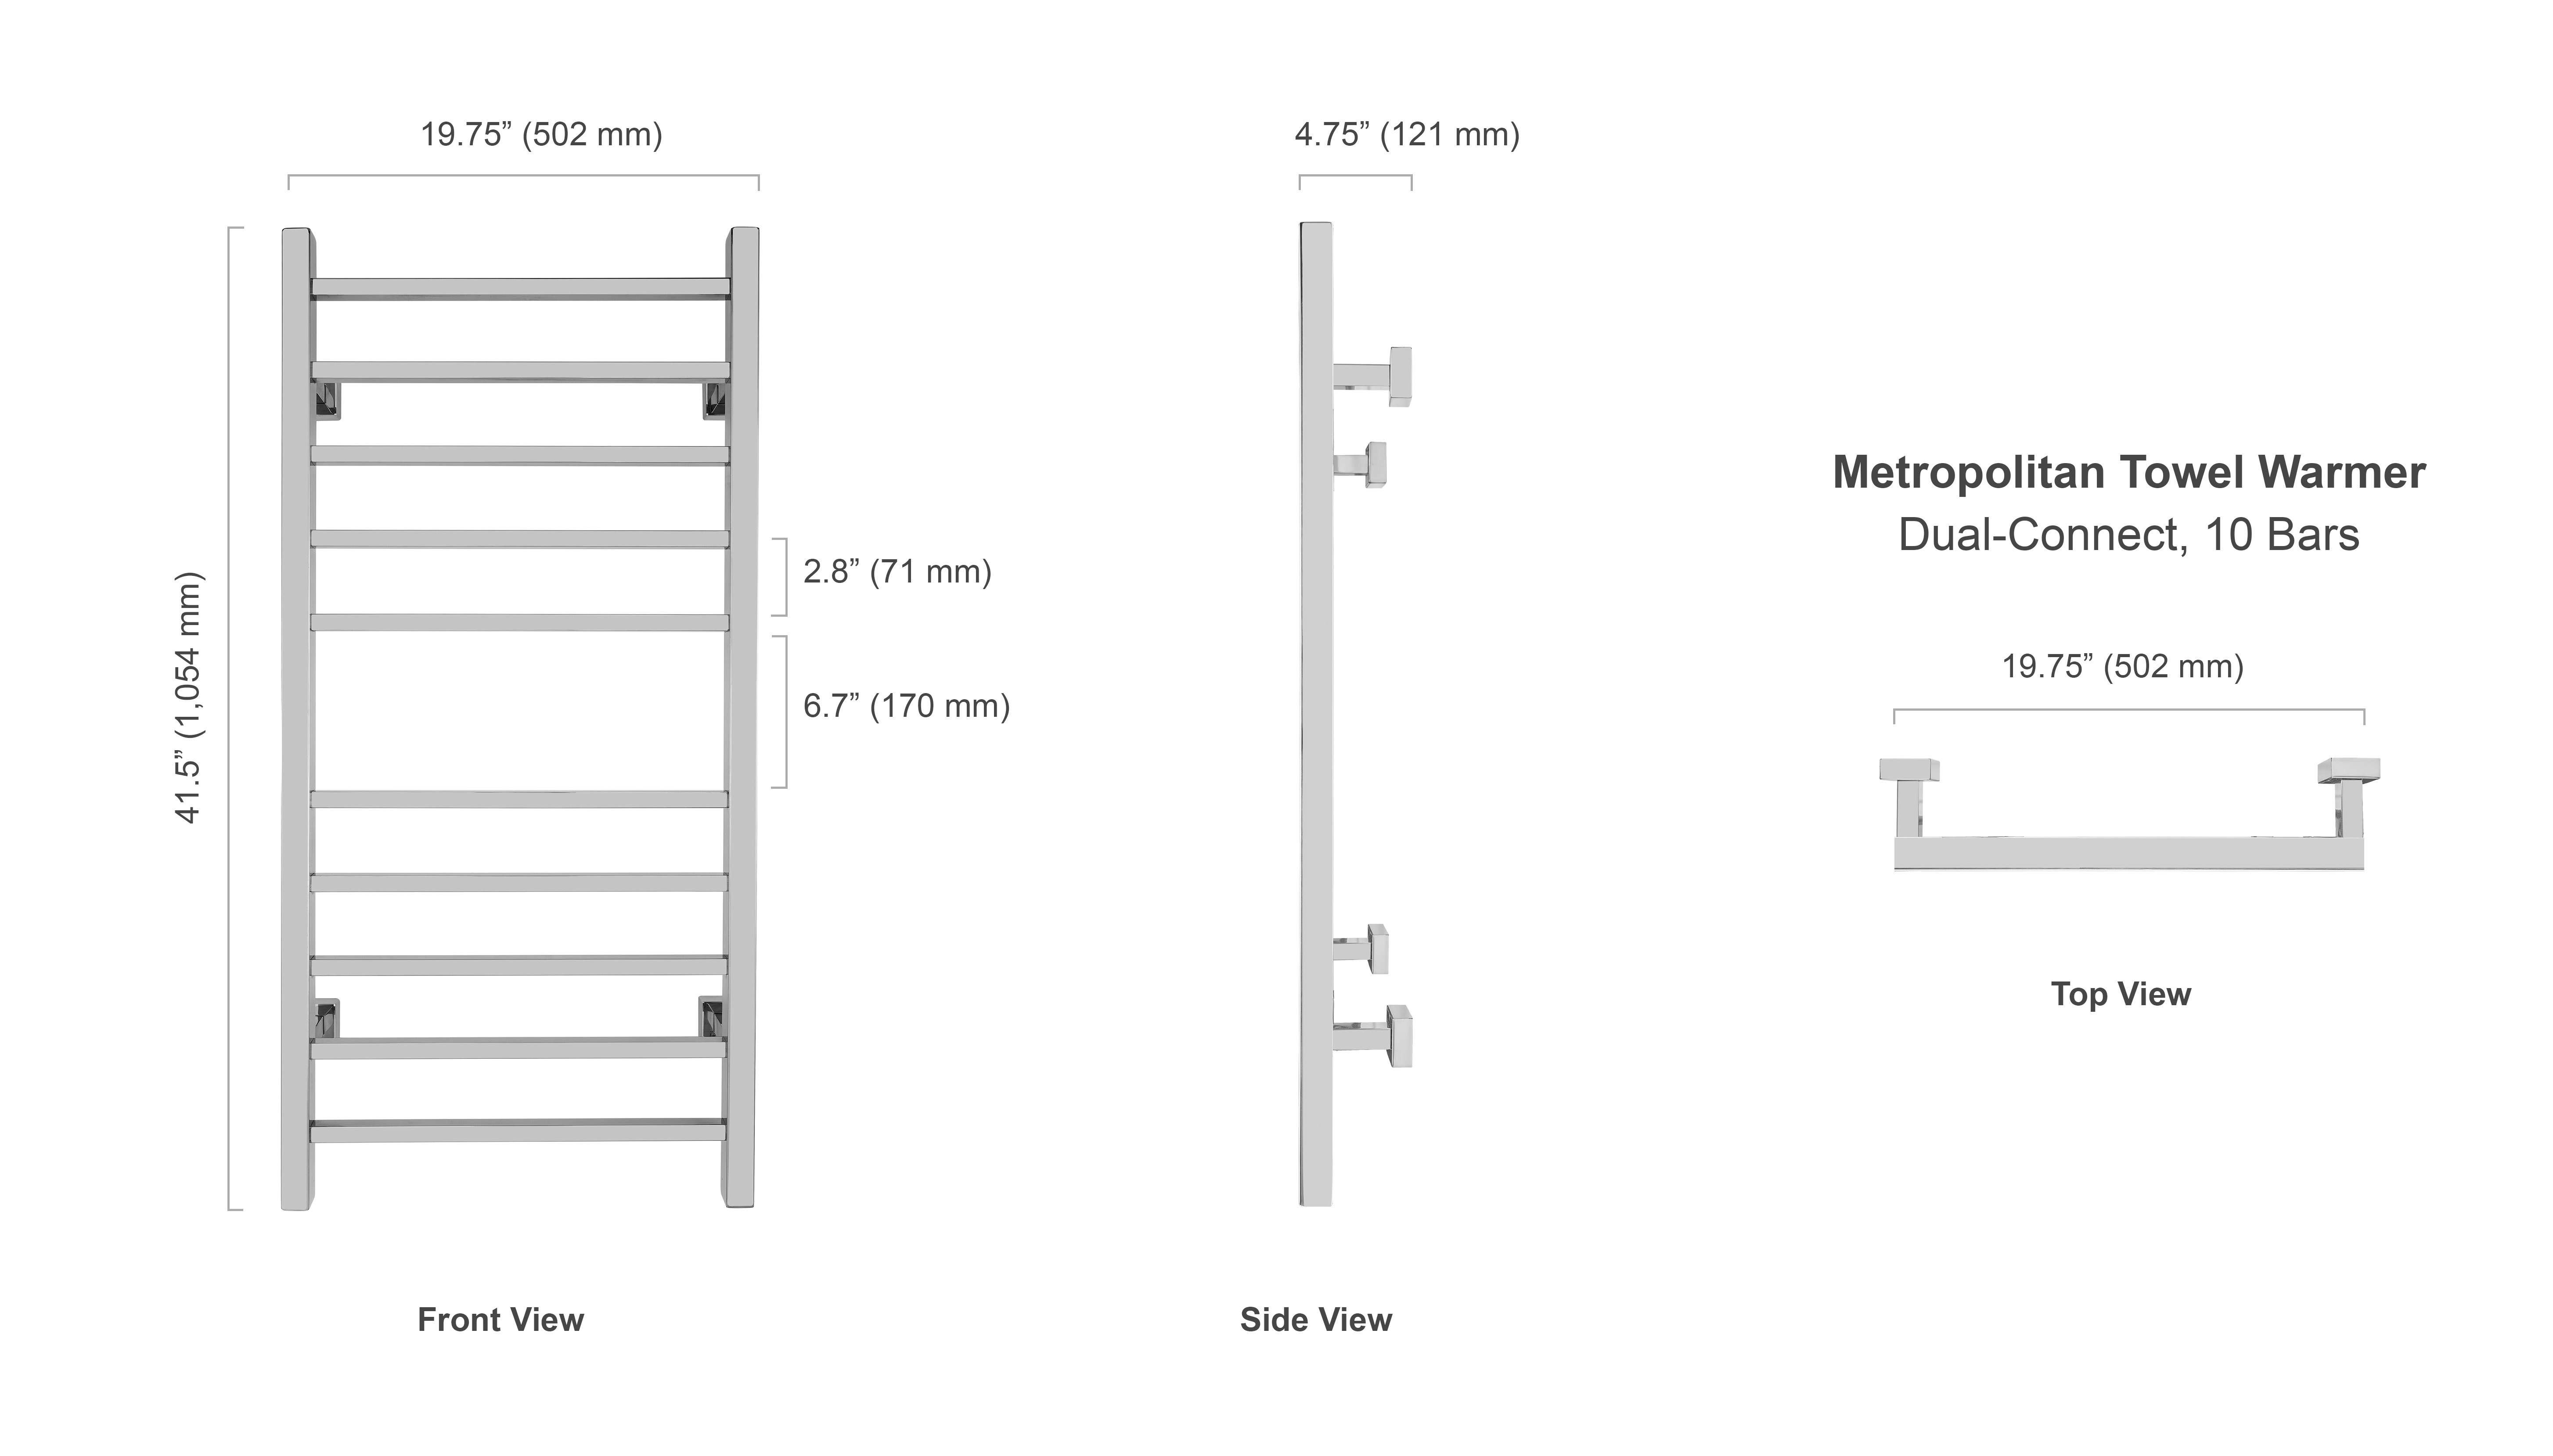 towel warmer metropolitan hardwired warmlyyours canadametropolitan towel warmer dimensions